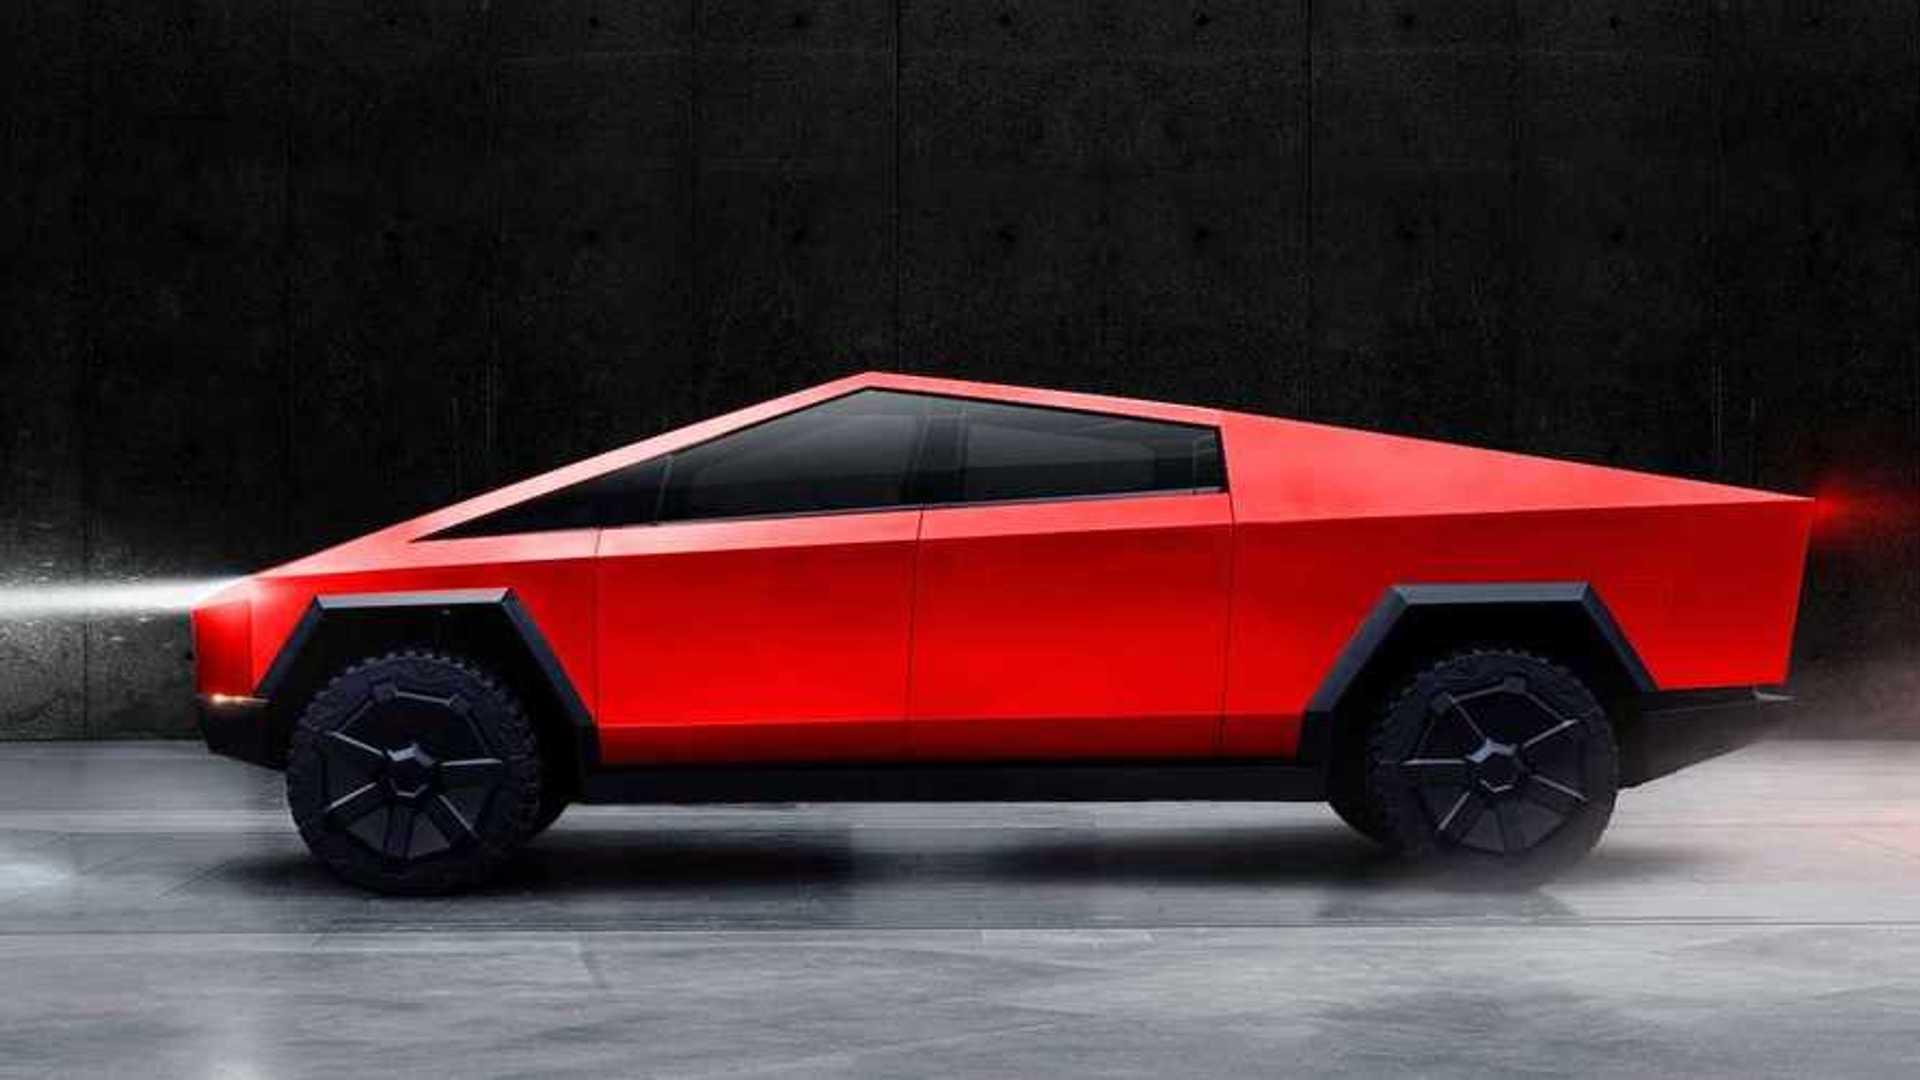 See the Tesla Cybertruck in flashy hues